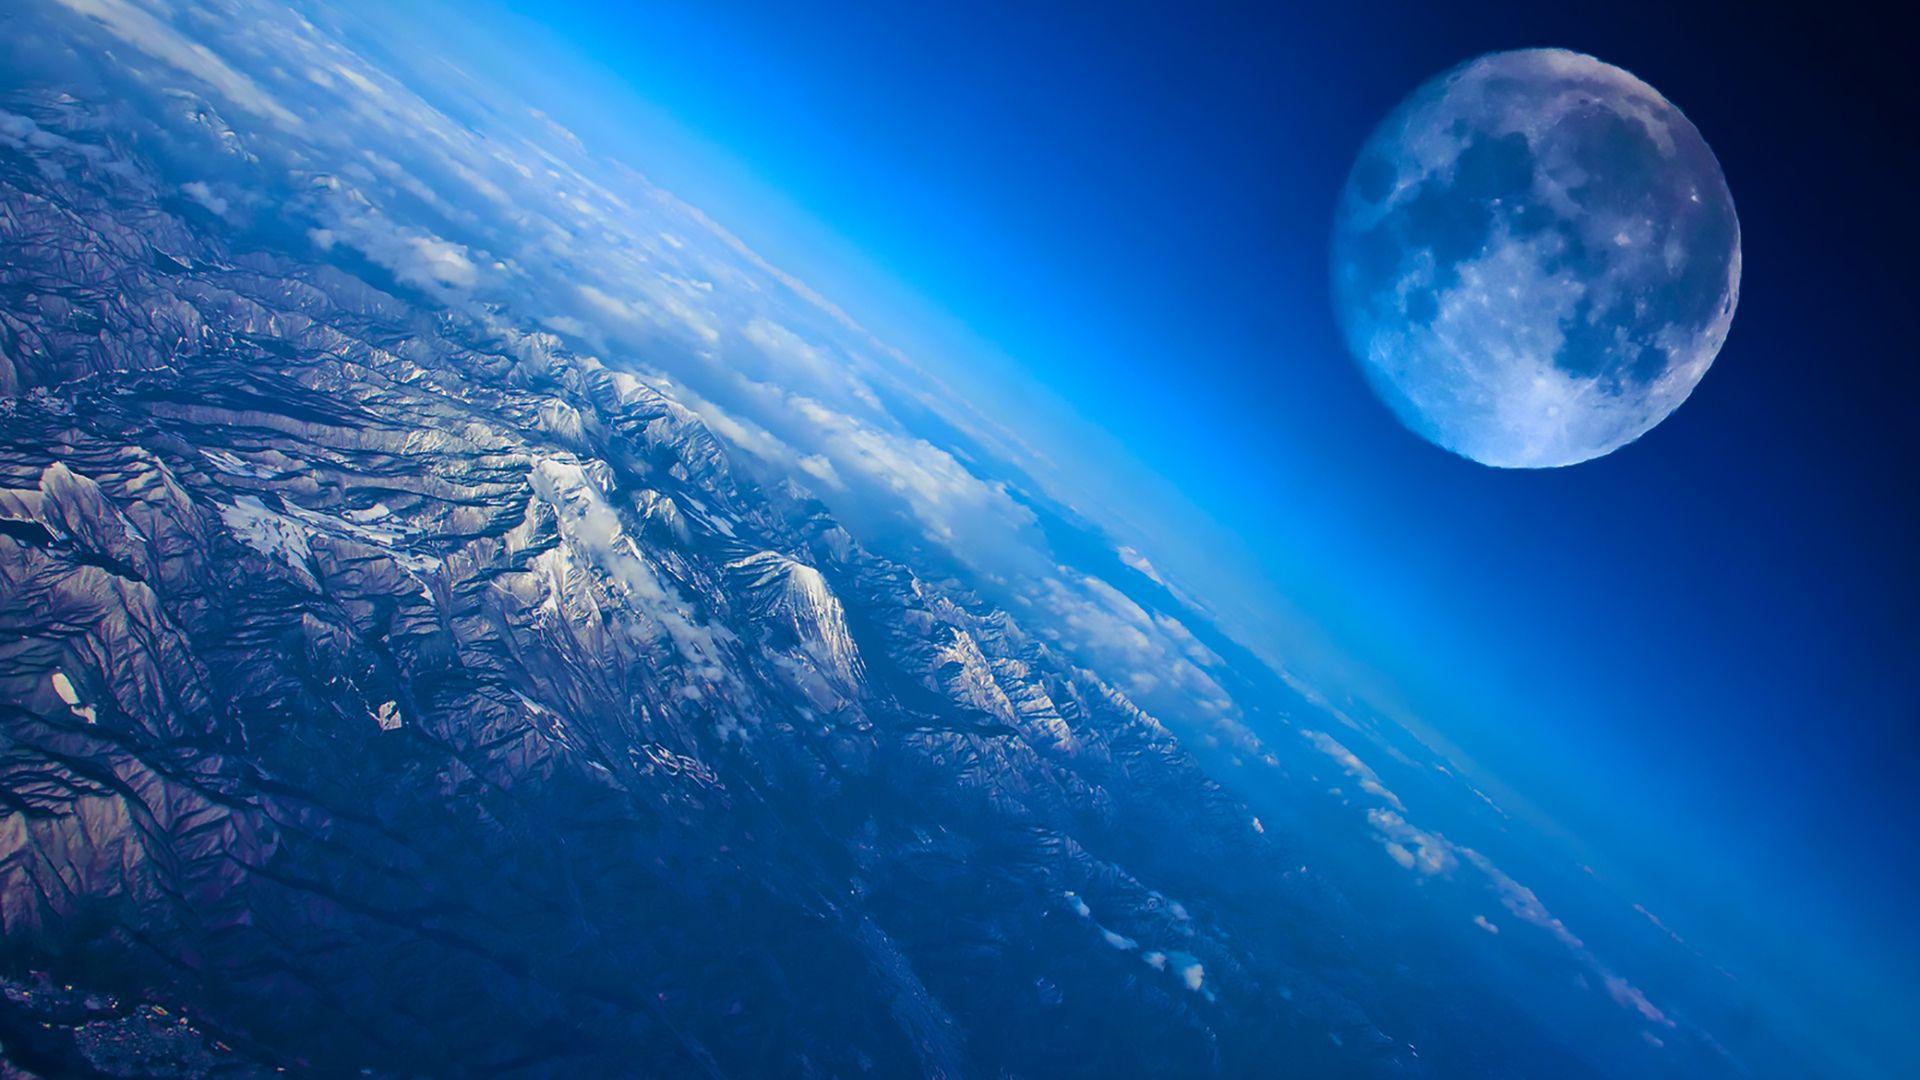 Earth desktop image